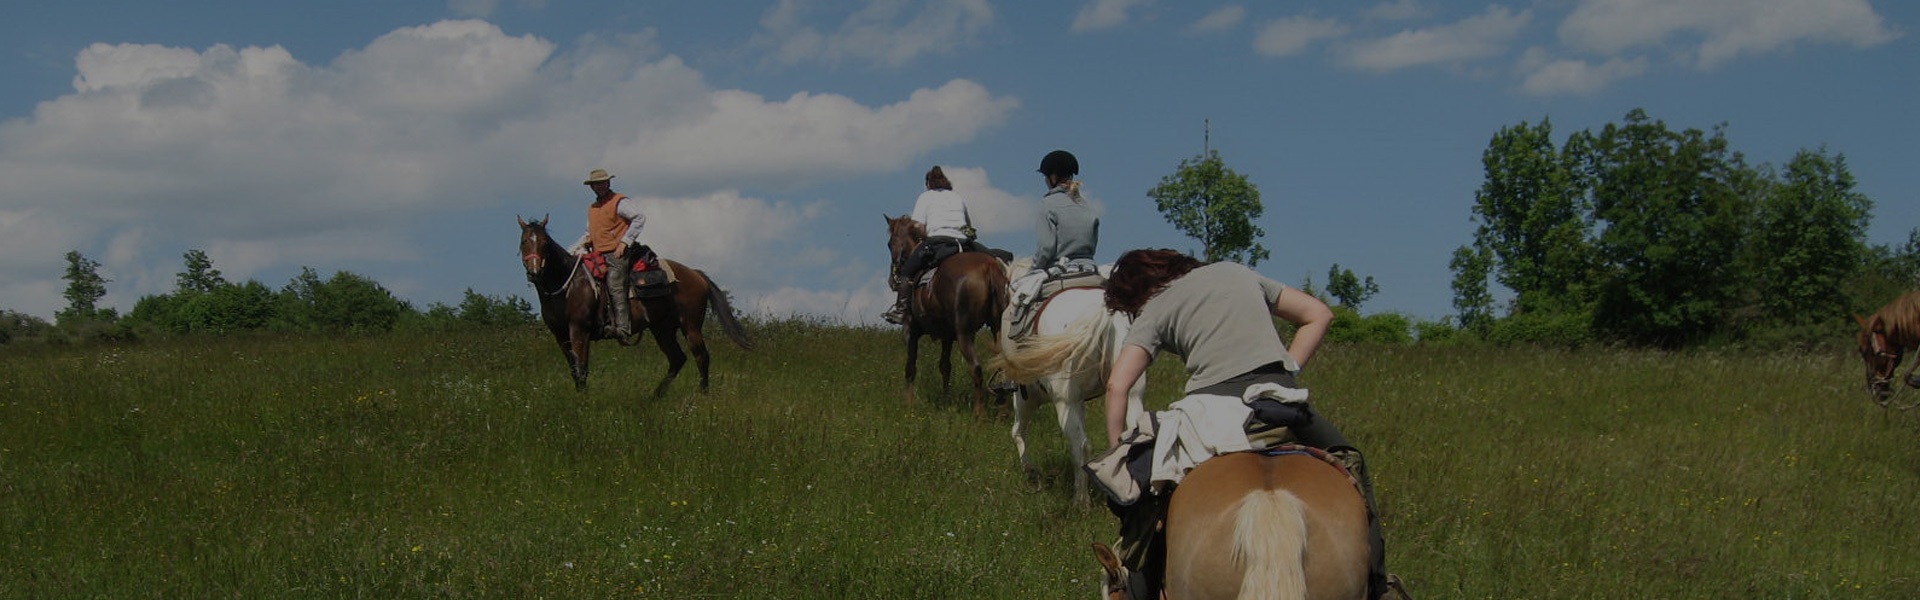 passeggiata cavallo agriturismo panoramico lago martignano roma lazio